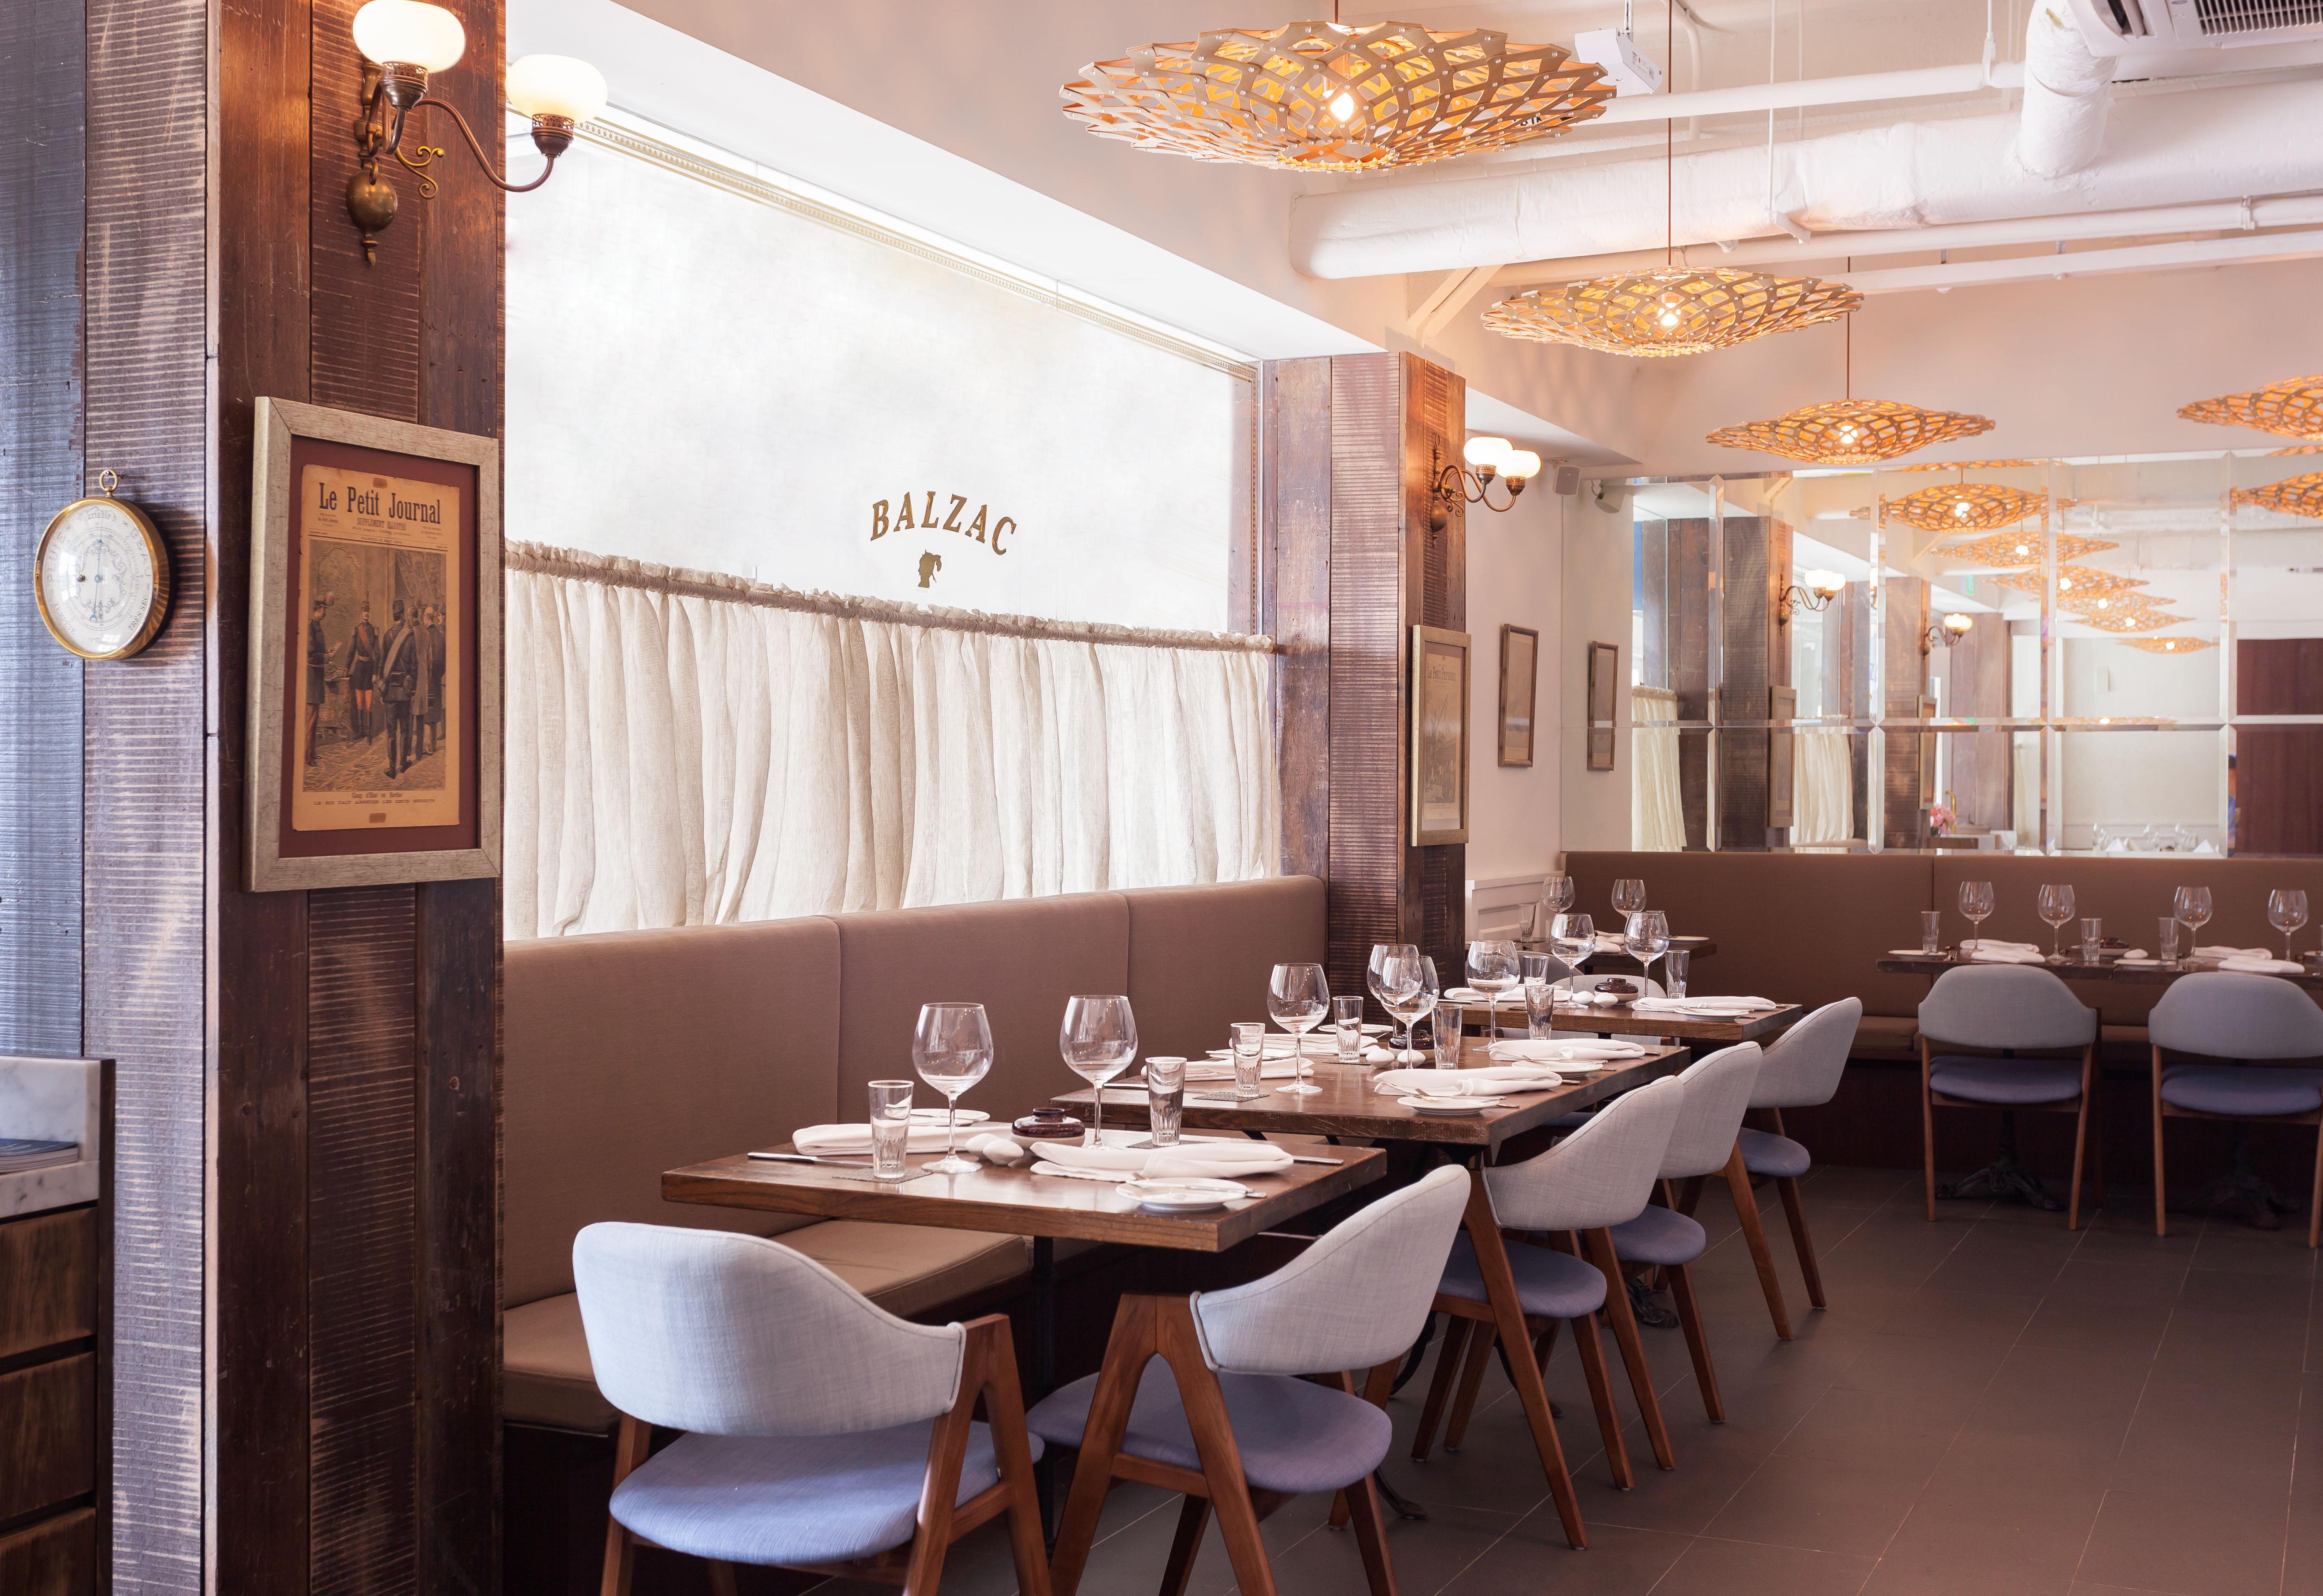 Balzac-Brasserie-Bar-fort-venuerific-blog-canning-art-center-restaurant